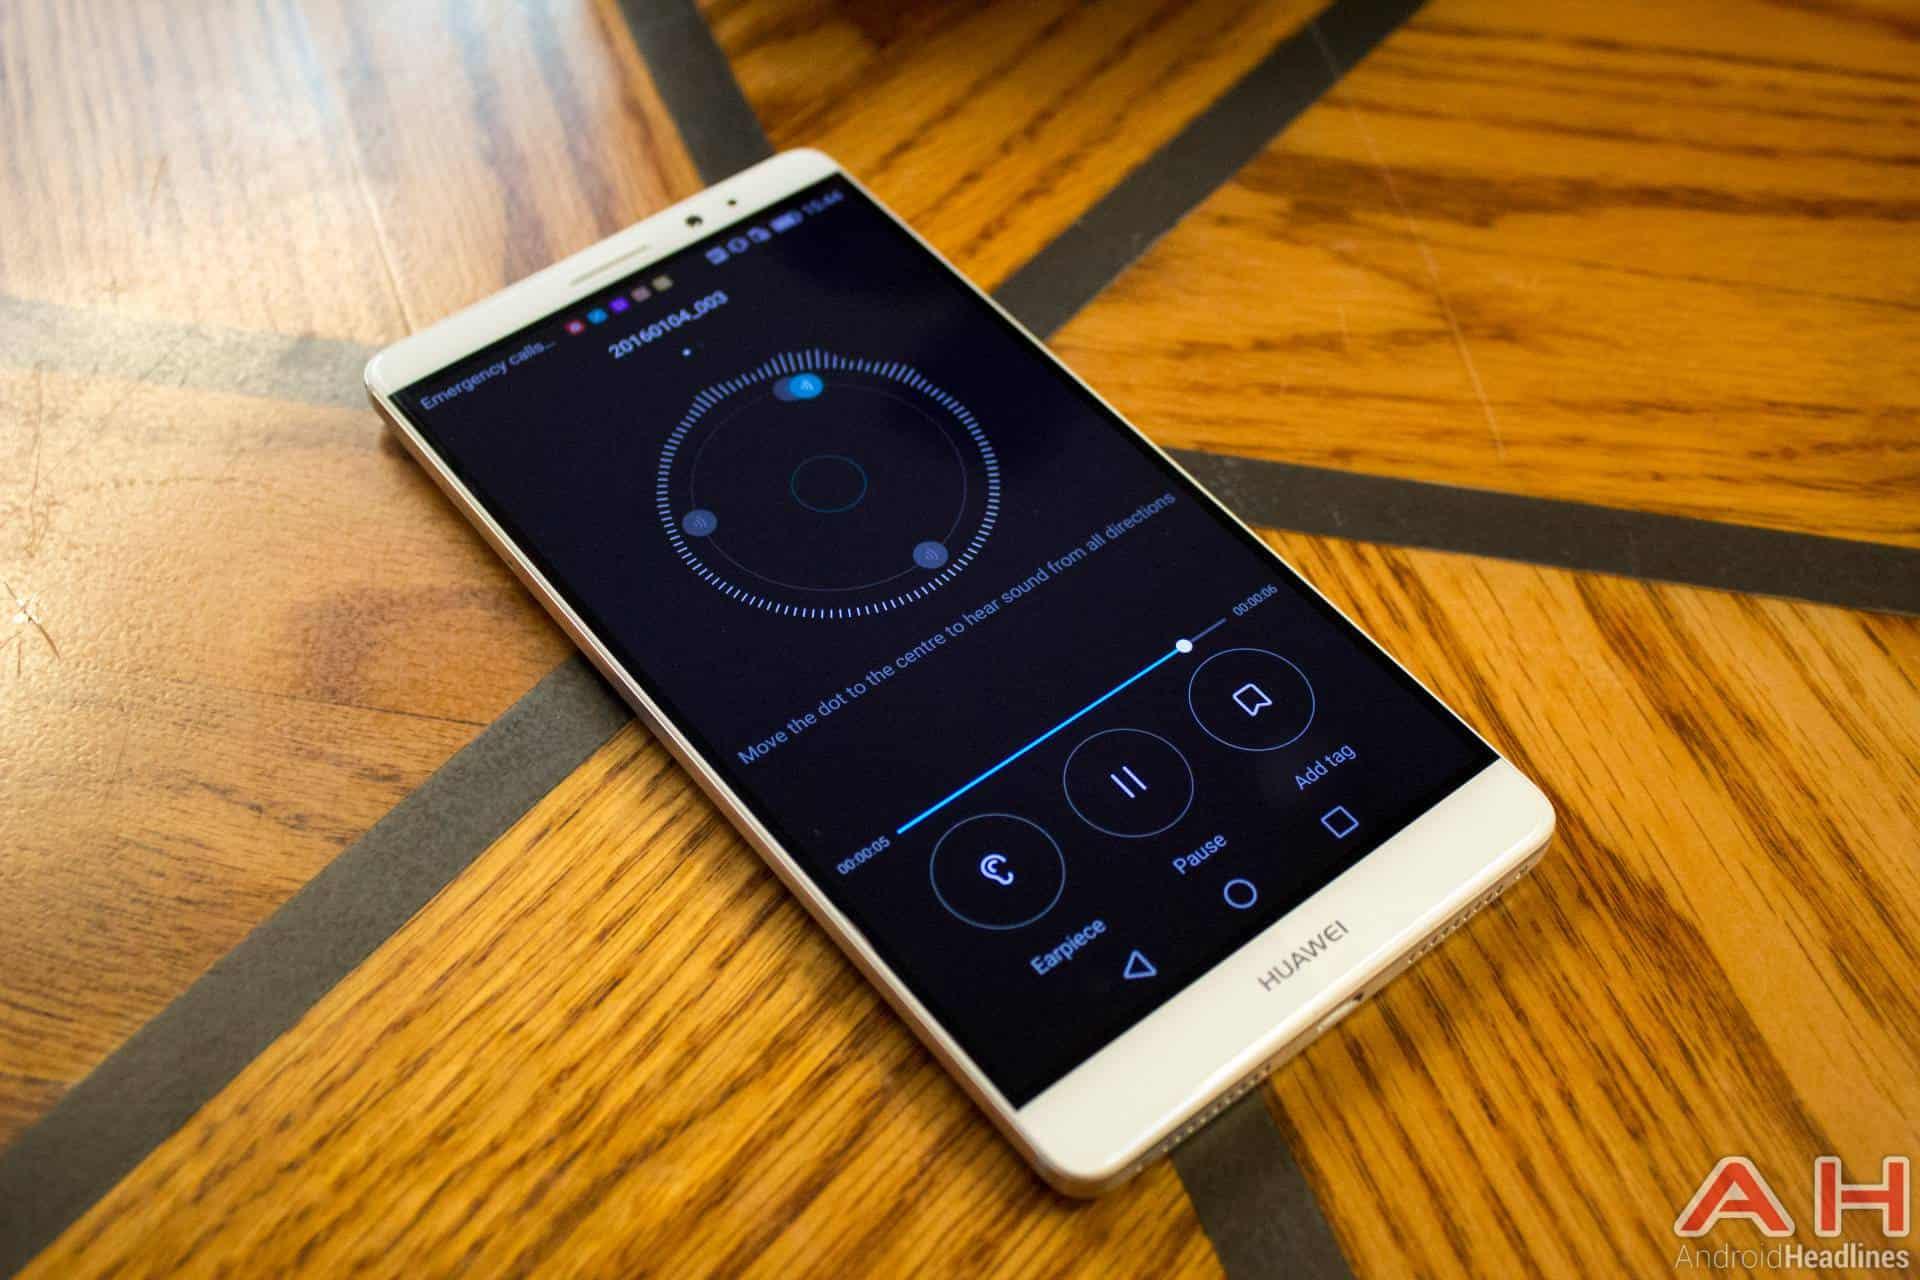 Huawei Mate 8 CES 2016 AH 10